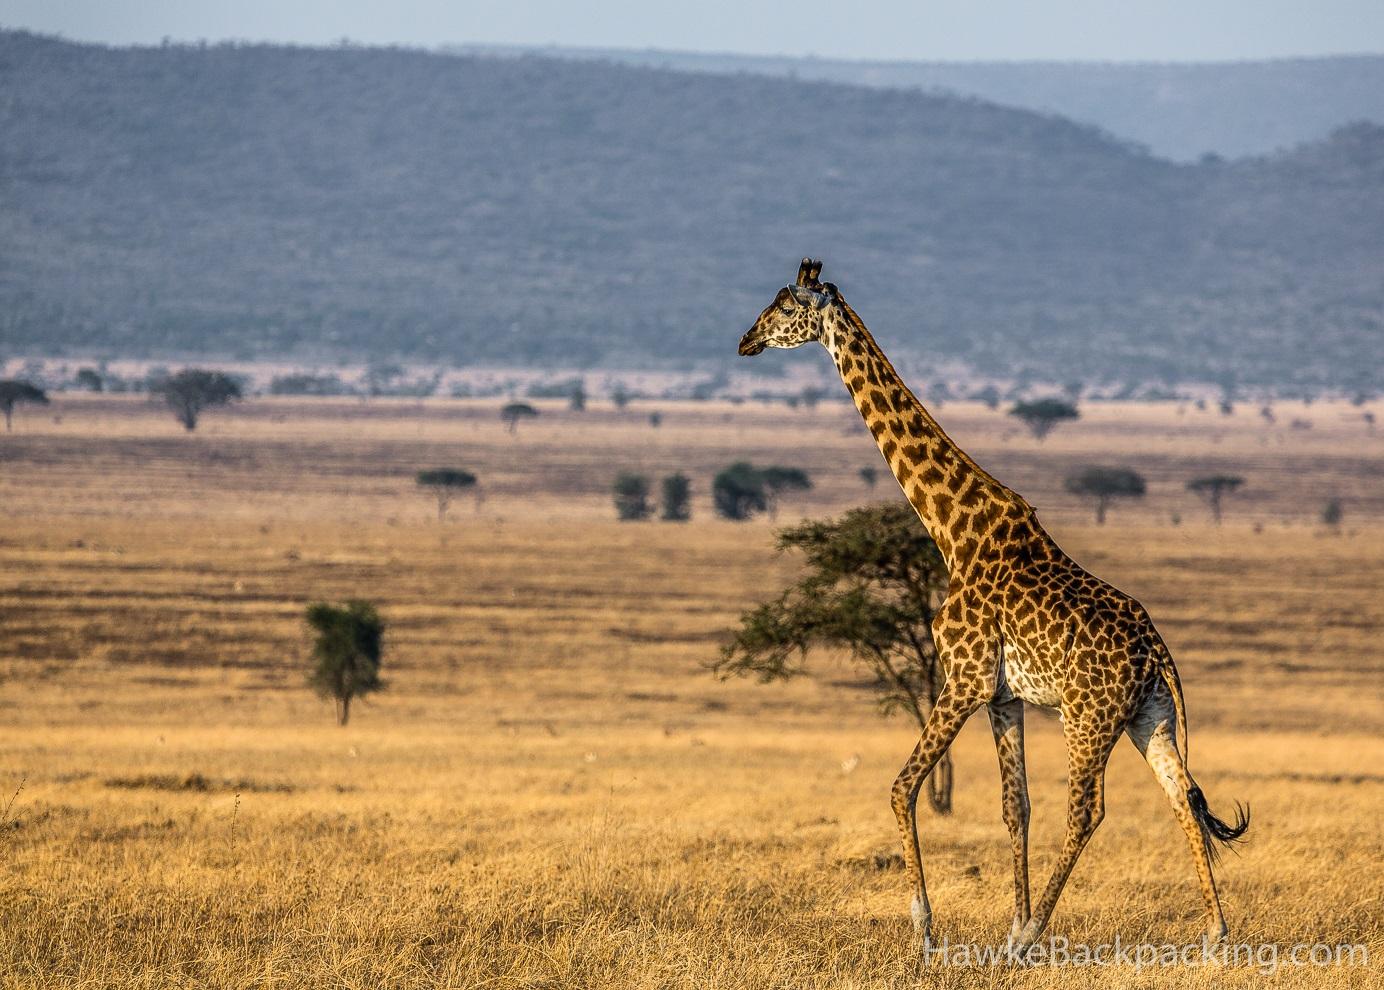 Serengeti Giraffes Hawkebackpacking Com